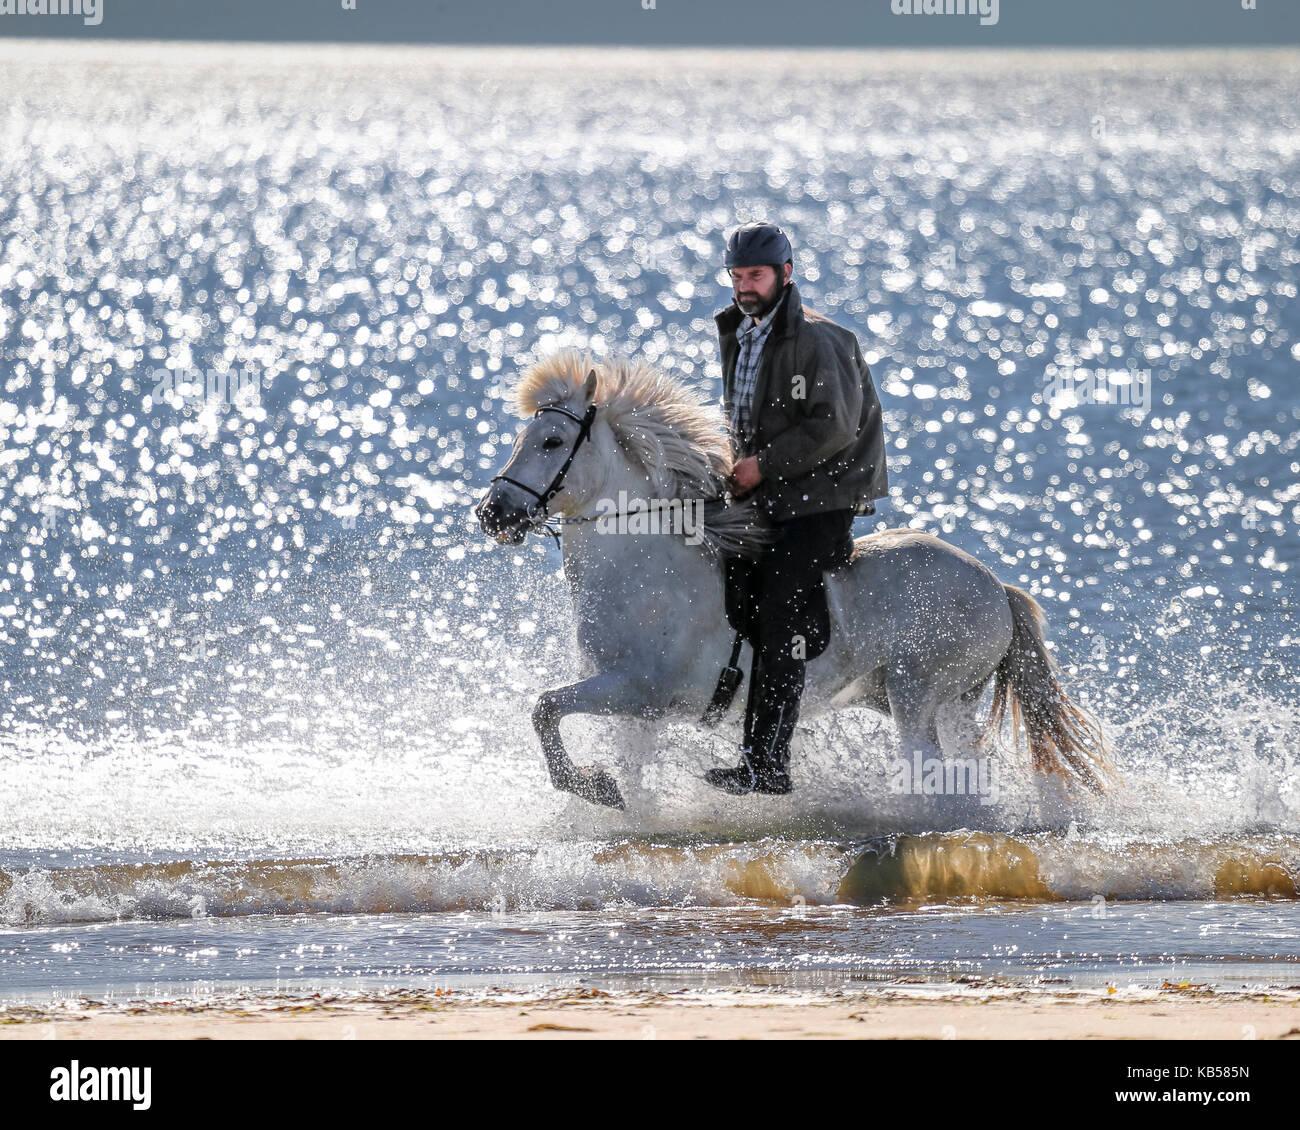 L'équitation sur longufjordur Beach, péninsule de snæfellsnes, l'islande Photo Stock